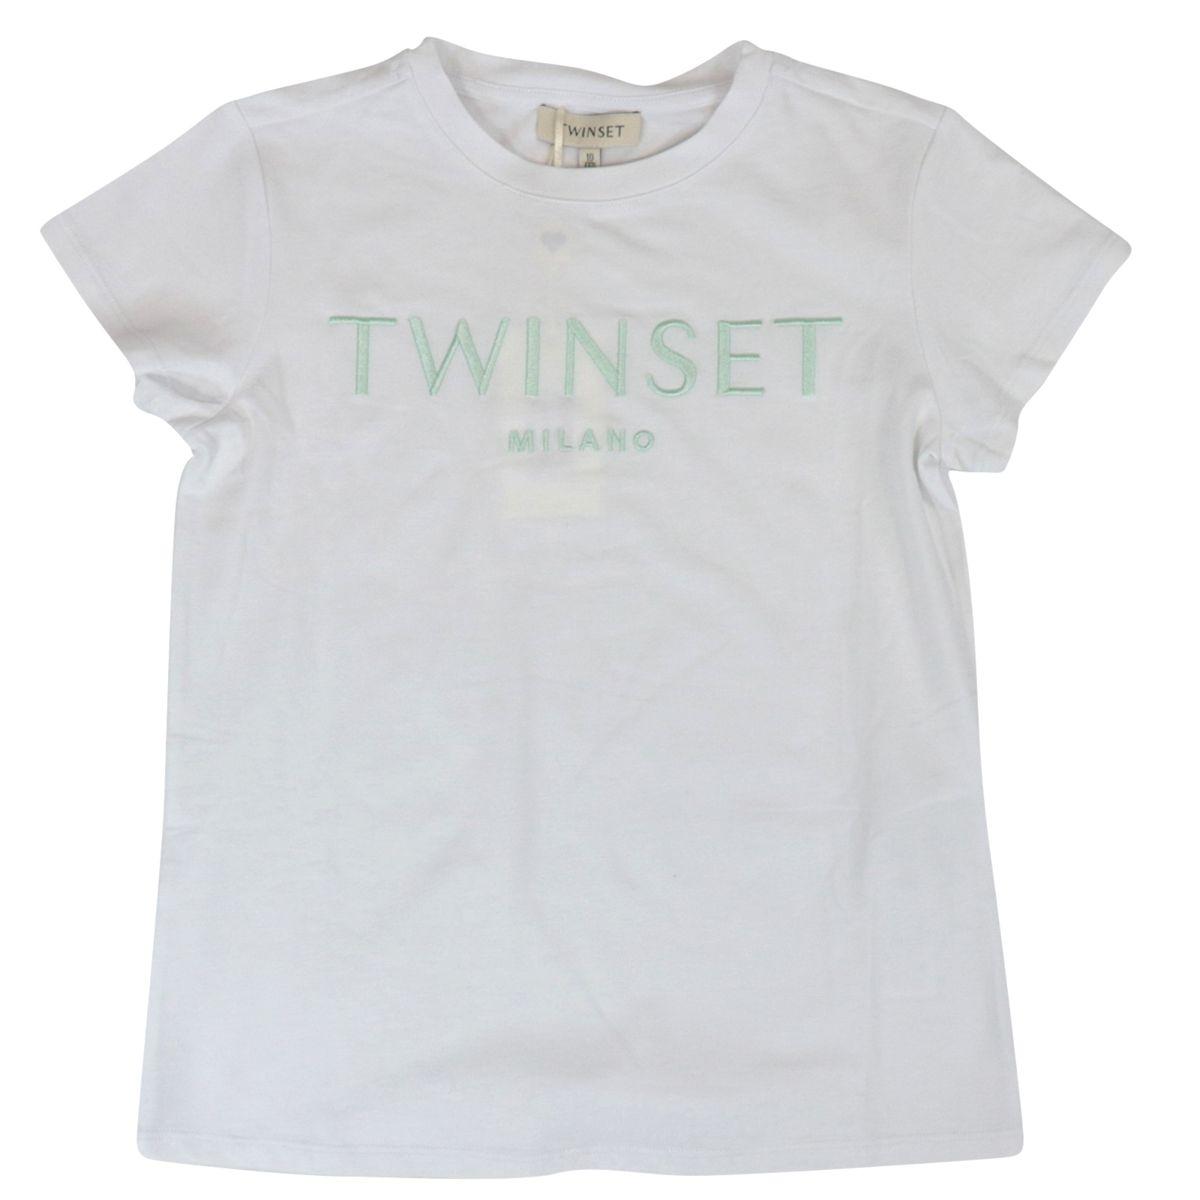 T-shirt in jersey di cotone con logo ricamato Bianco/verde Twin-Set